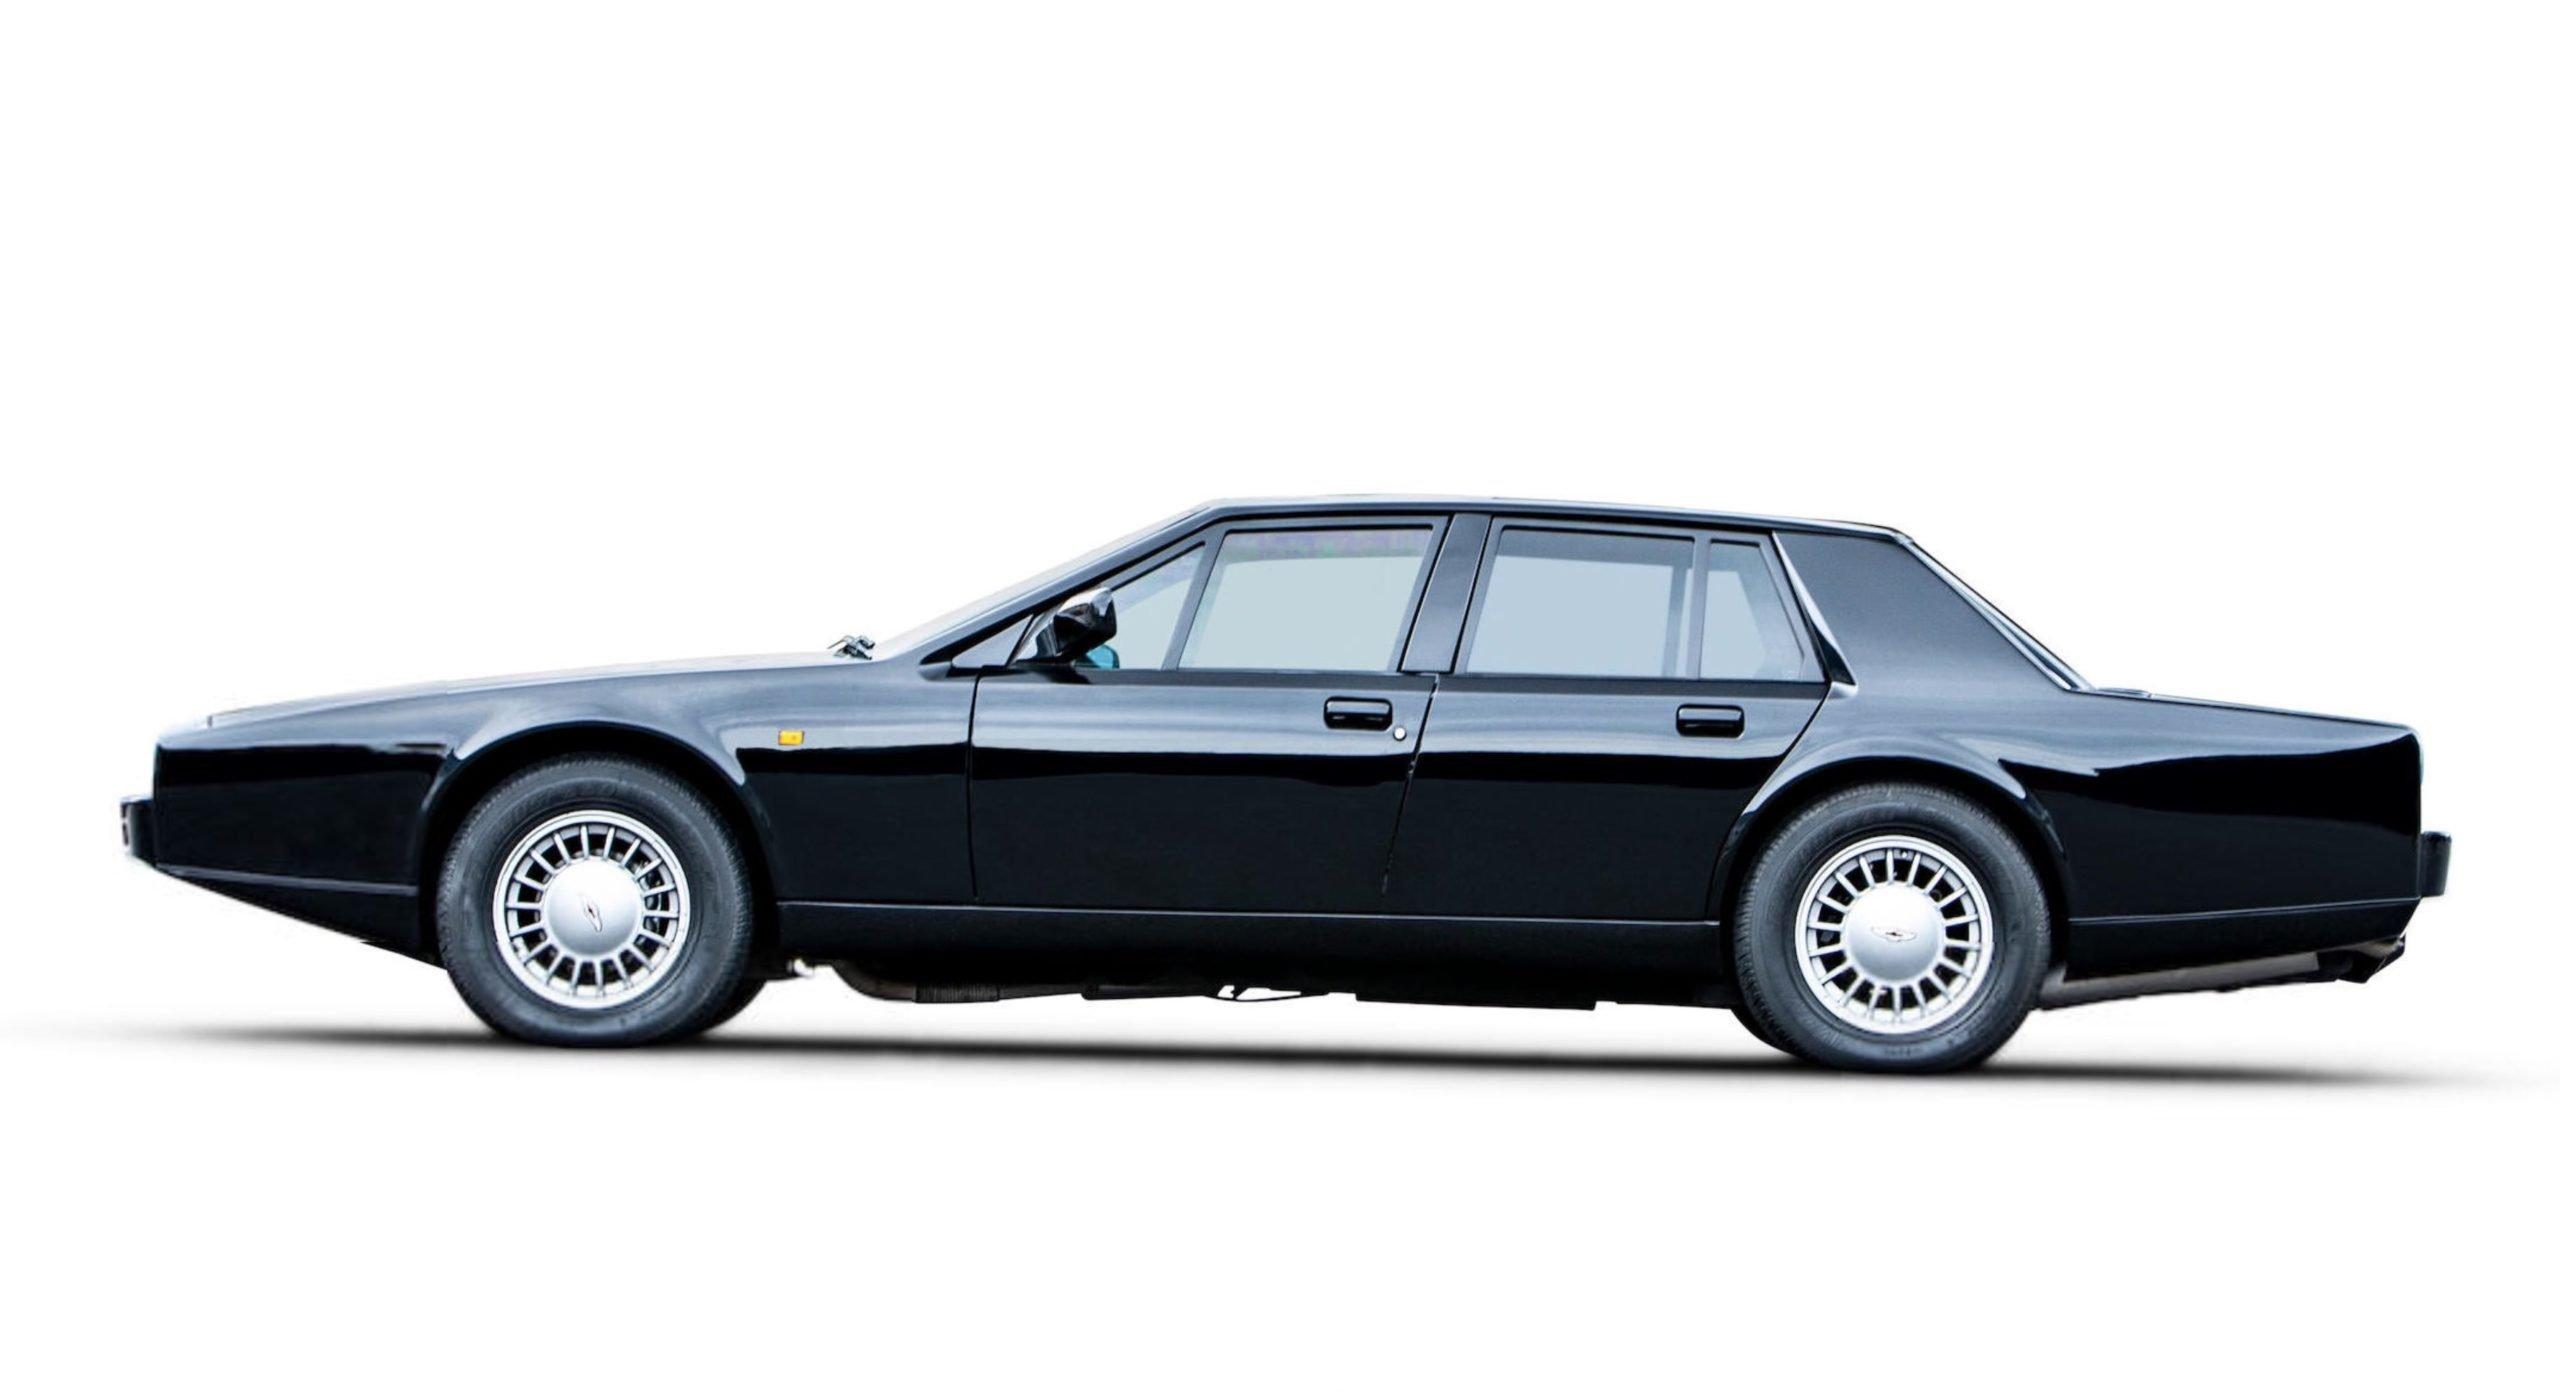 Speaking Of Controversial Wedge Shaped Vehicles The Aston Martin Lagonda Series 4